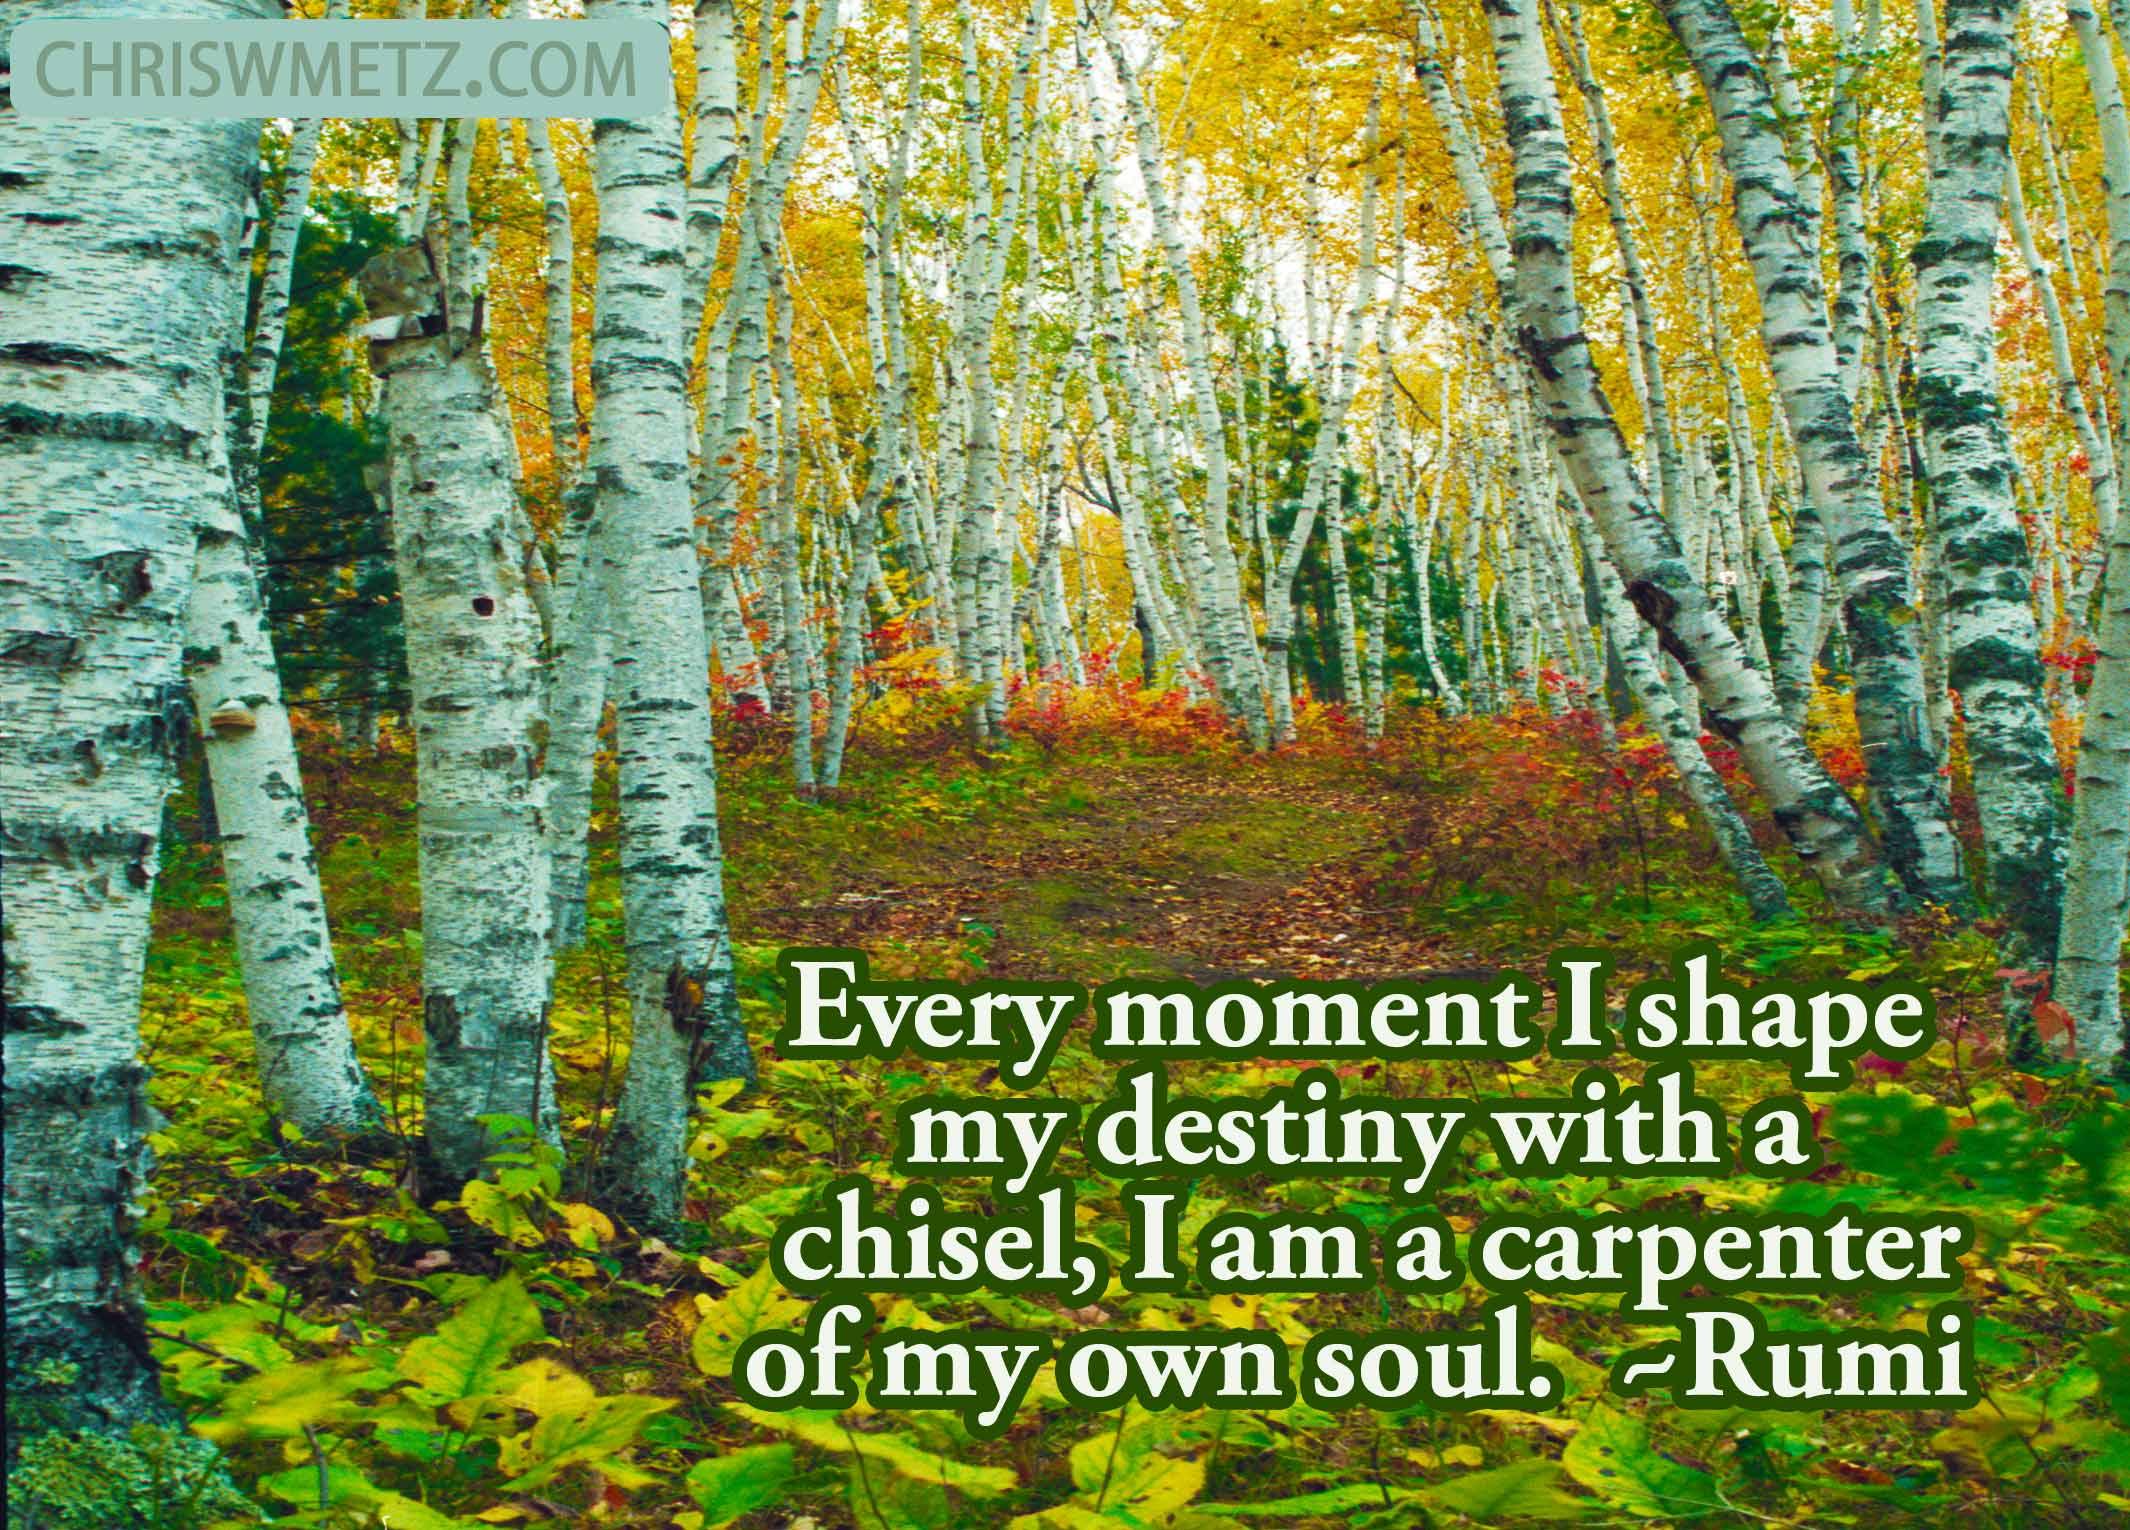 Soul Quote 3 Rumi Chris W Metz